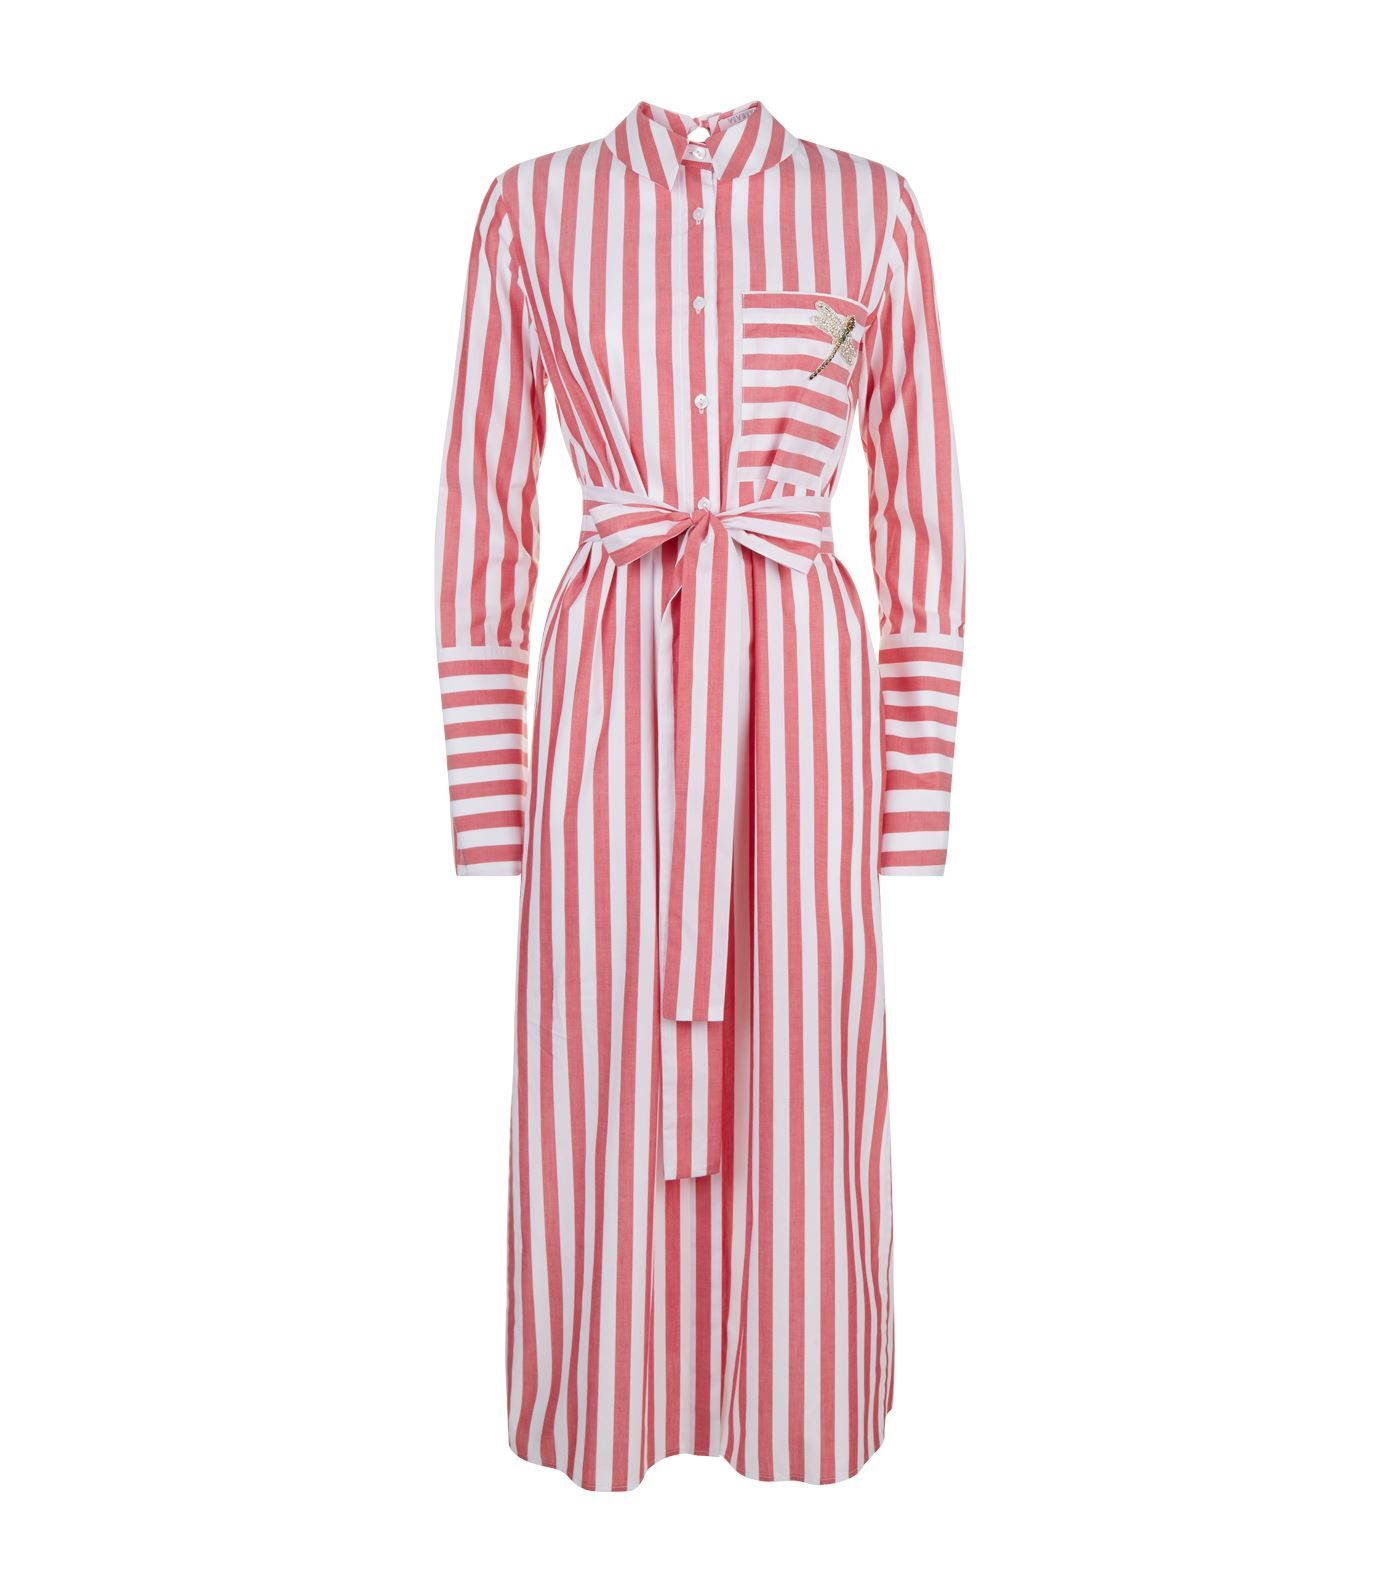 891df36709b VIVETTA Striped Embellished Cotton Shirt Dress